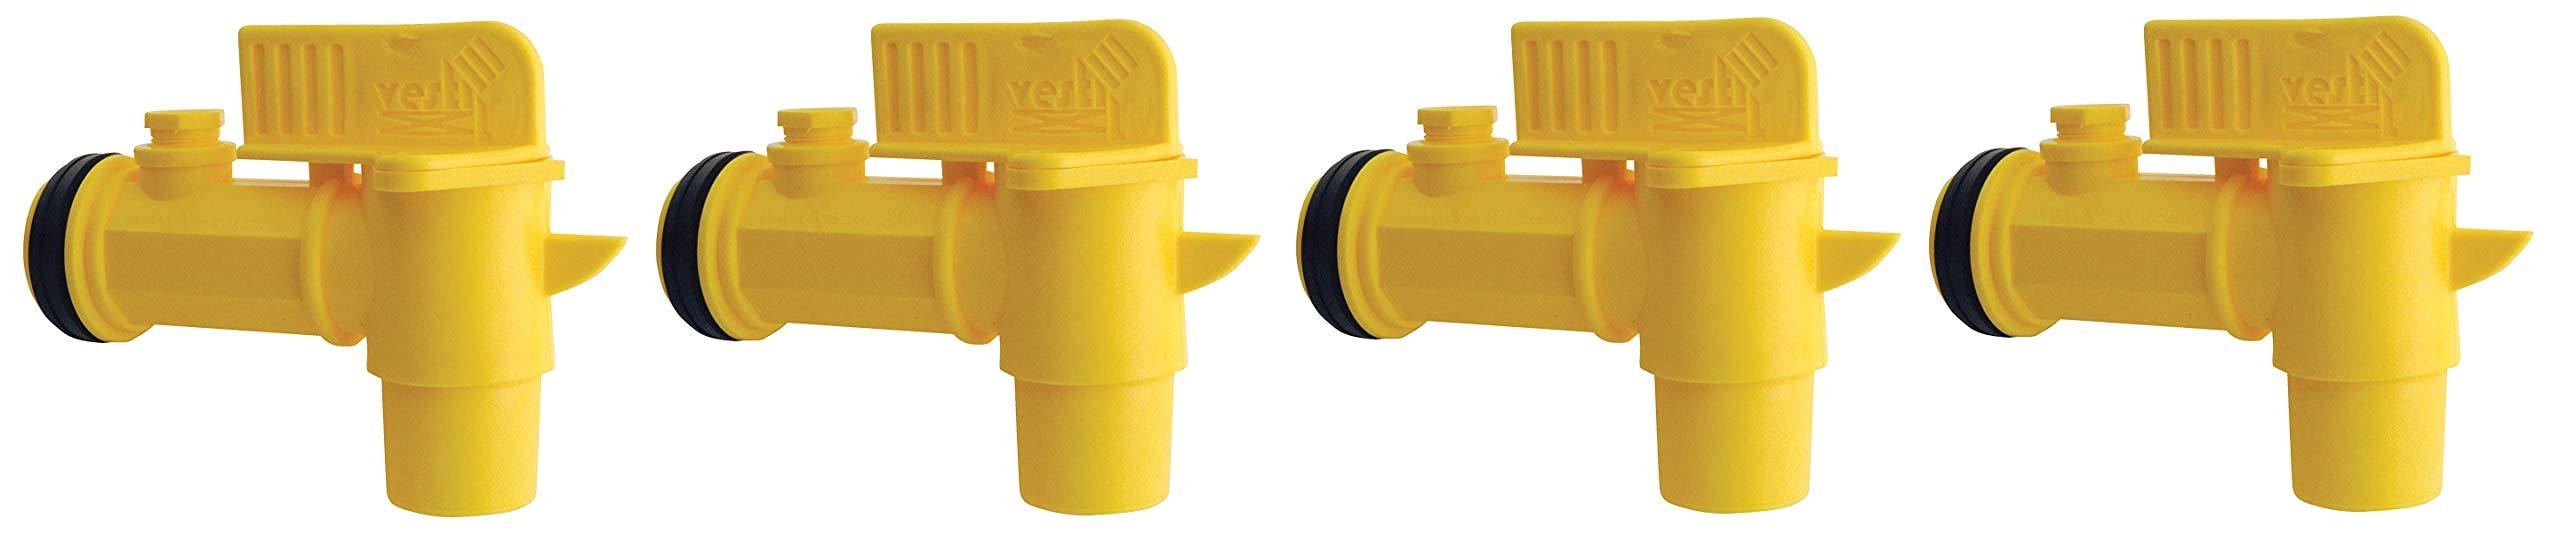 Vestil JDFT Plastic Manual Handle Jumbo Drum Faucet, Fits 2'' Drum Openings (Fоur Расk)